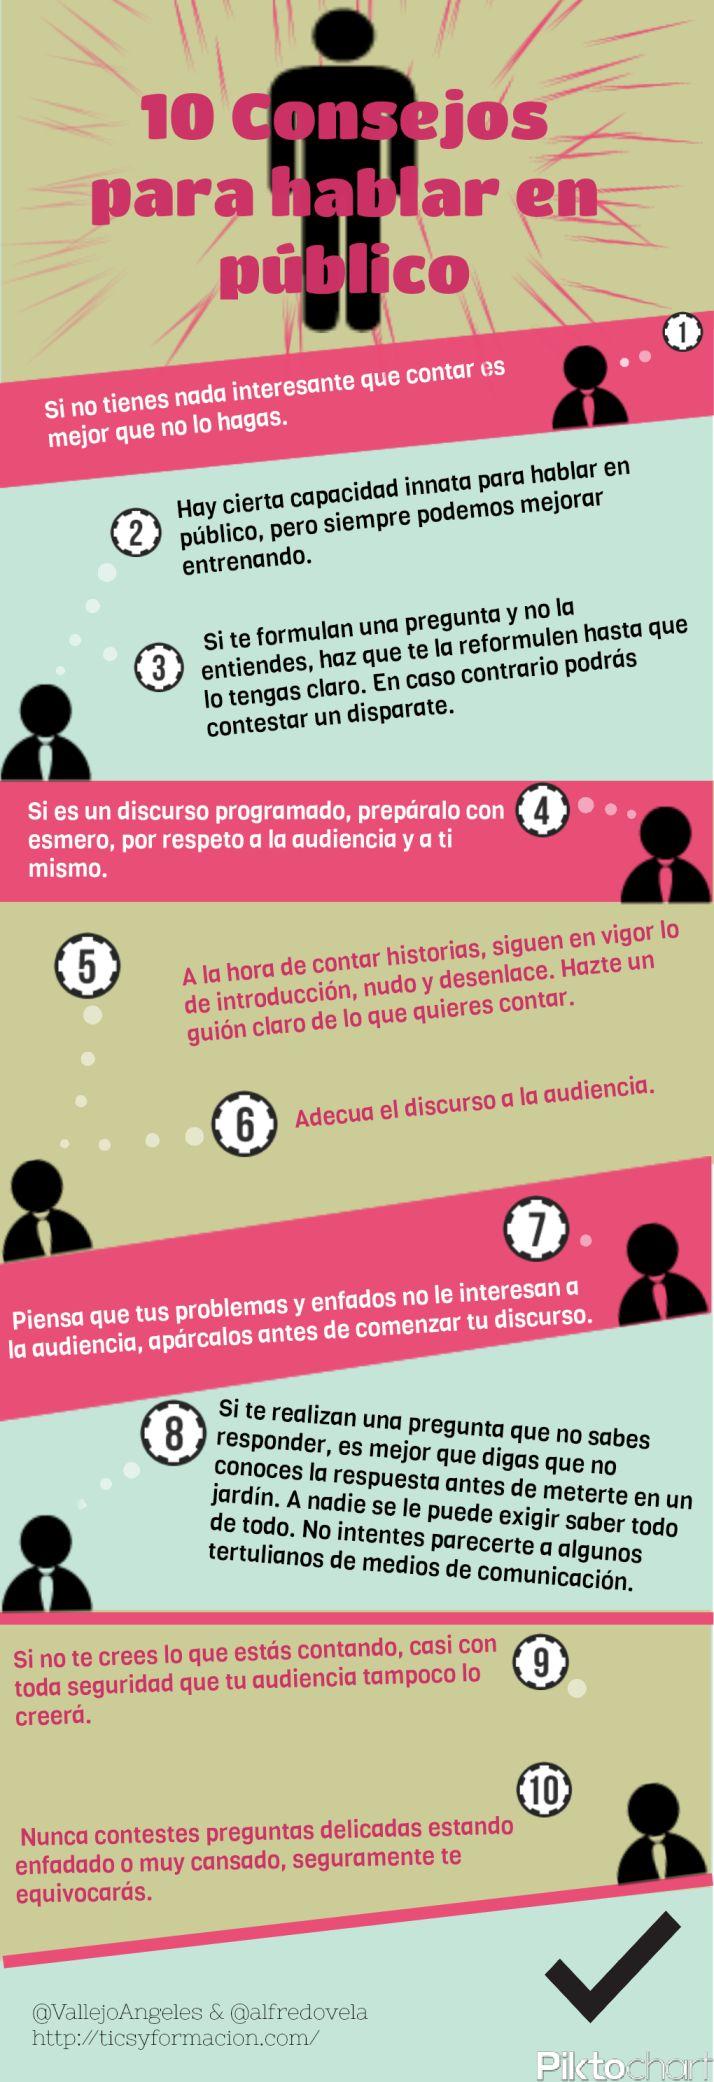 10 consejos para Hablar en Público #infografia #infographic @Sofia Uribe Correa @AugustoPUBLITAL